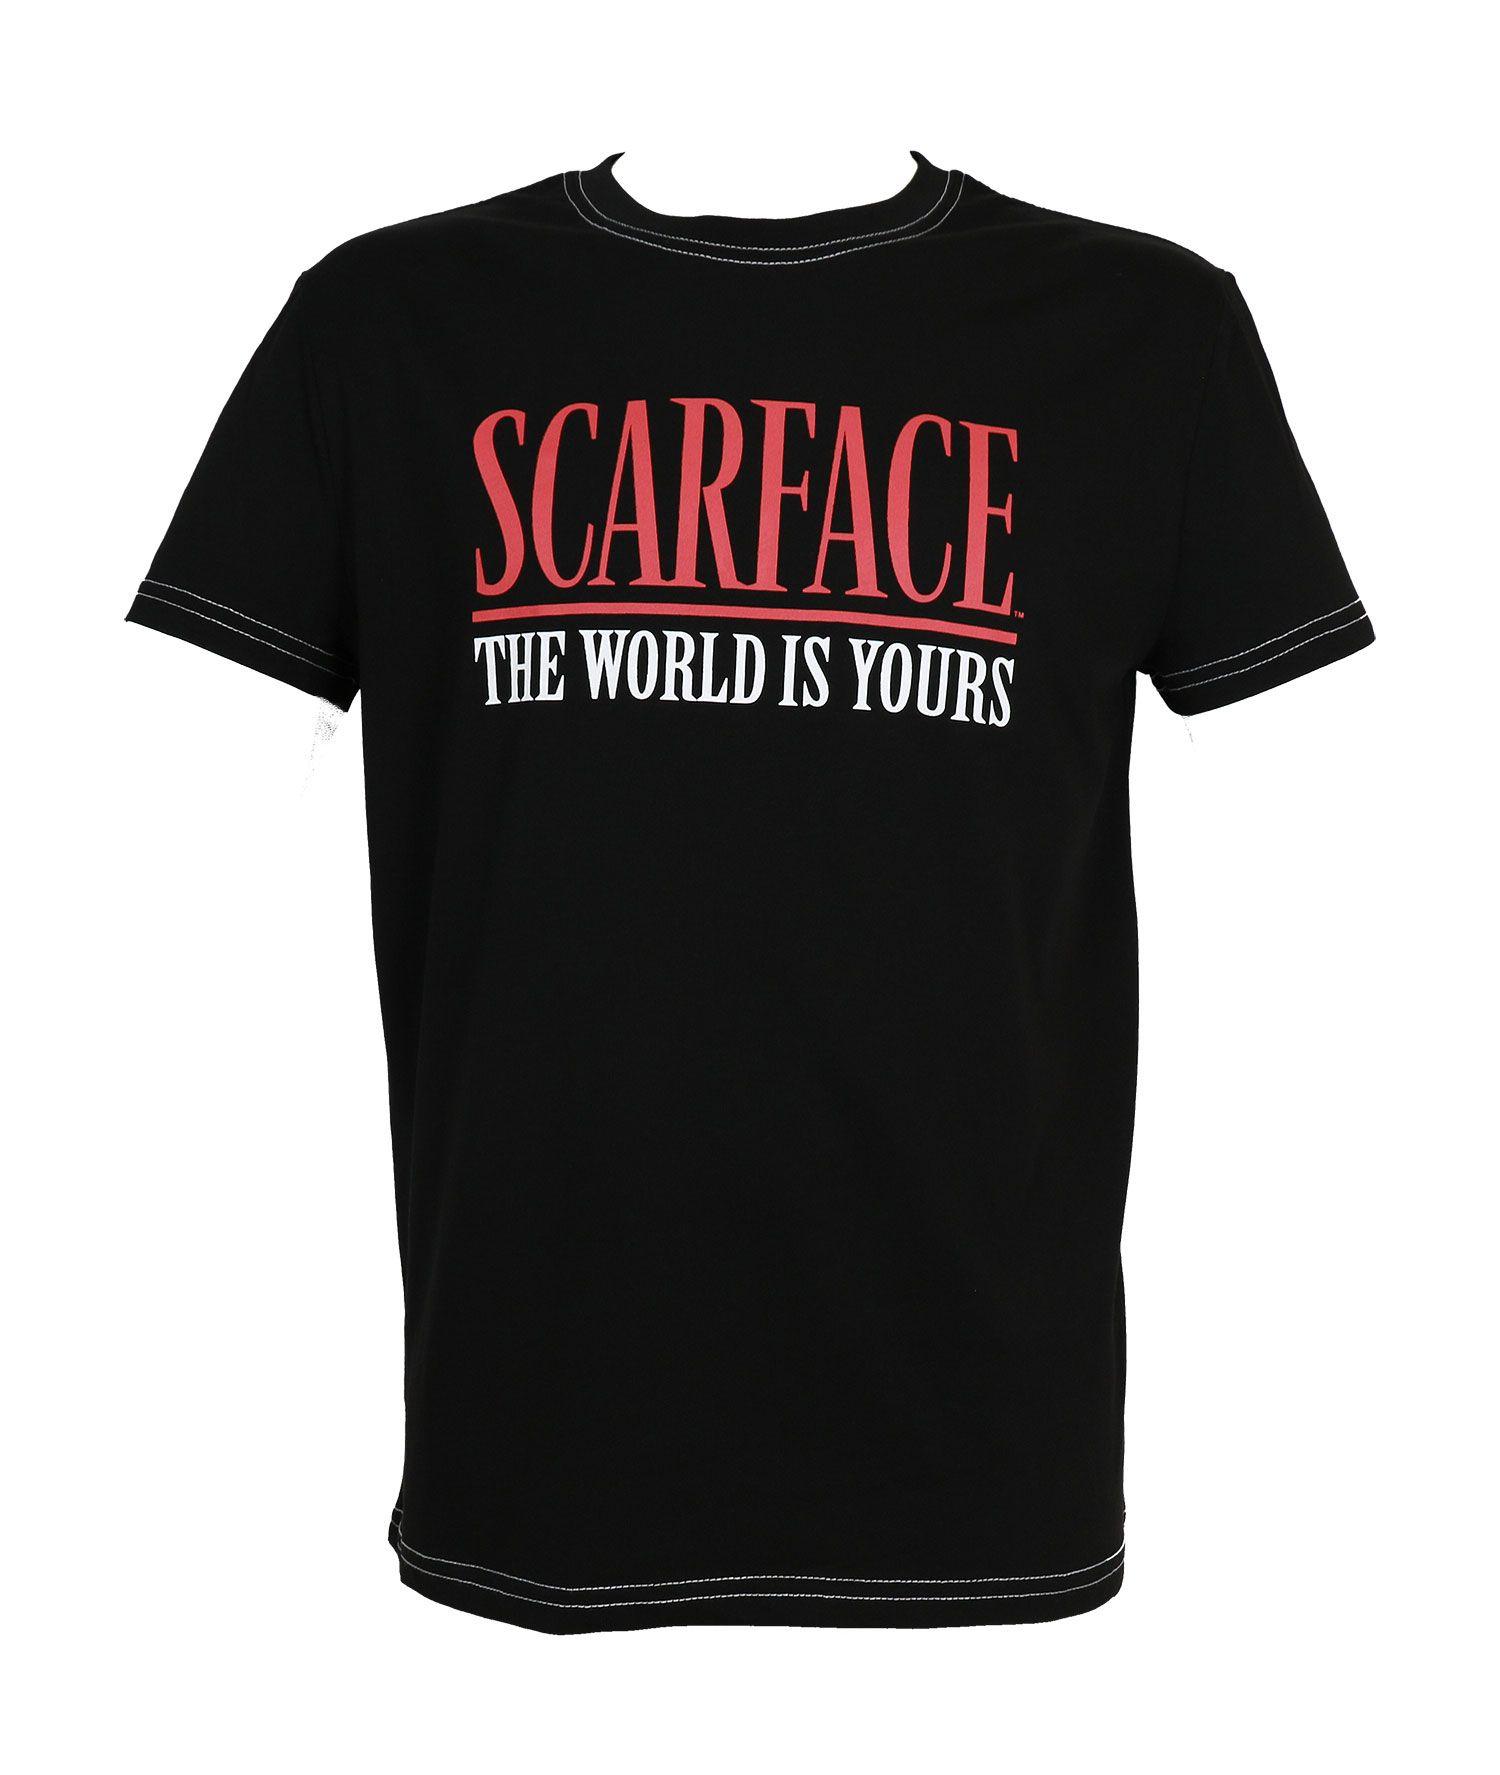 Scarface T-Shirt Logo Size XXL